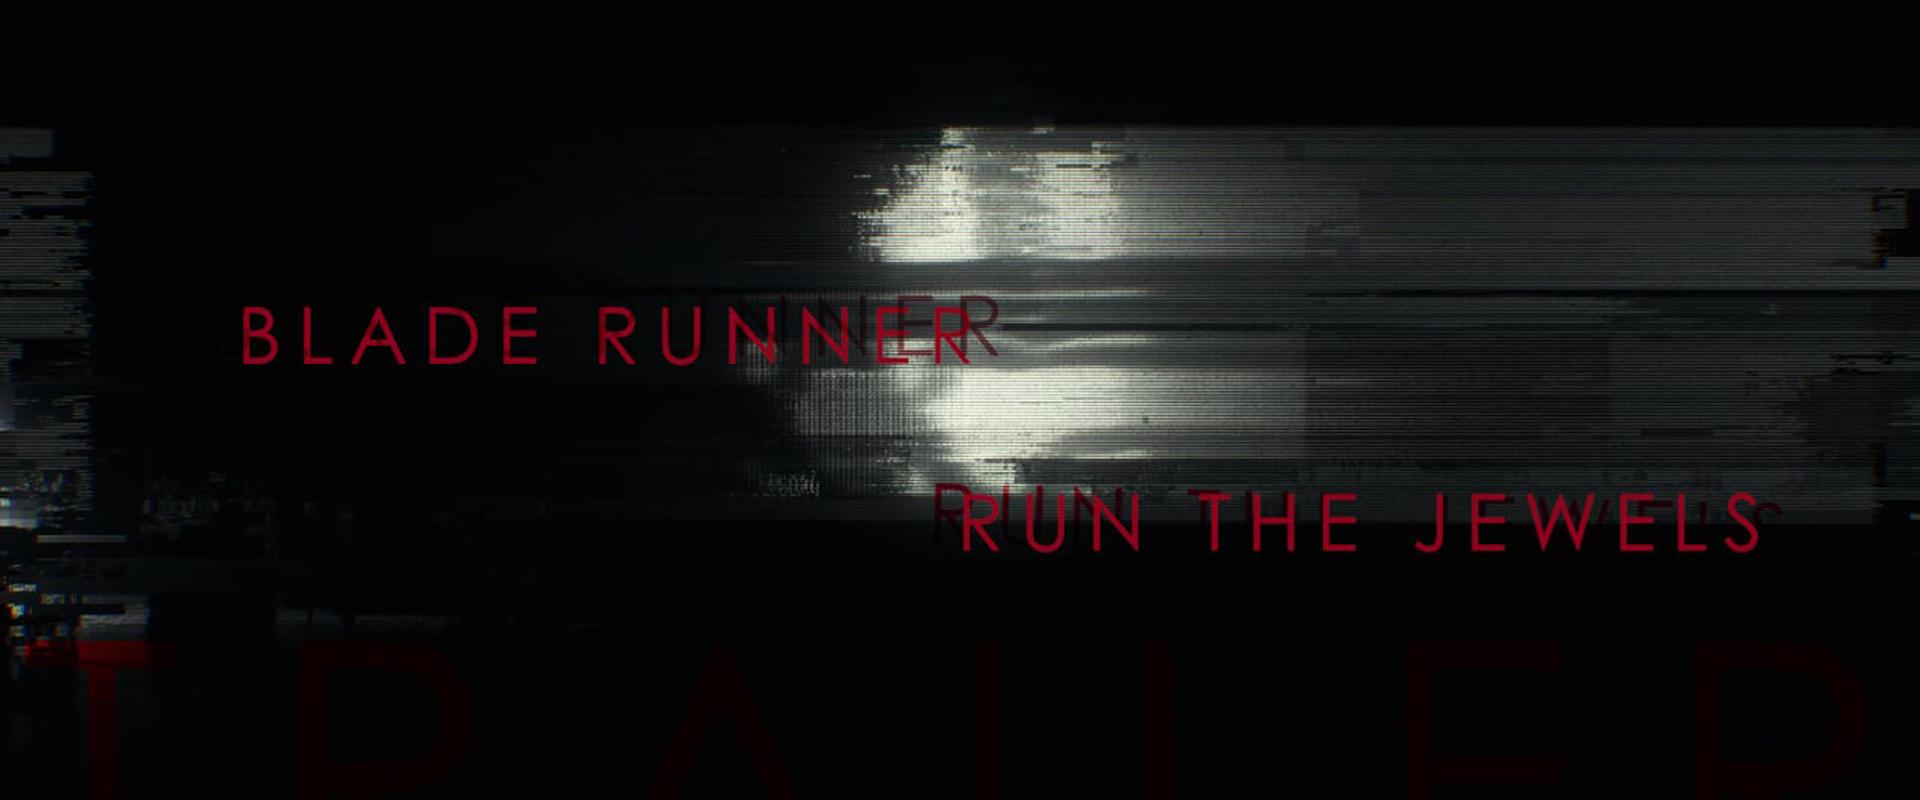 blade runner run the jewels thumbnail